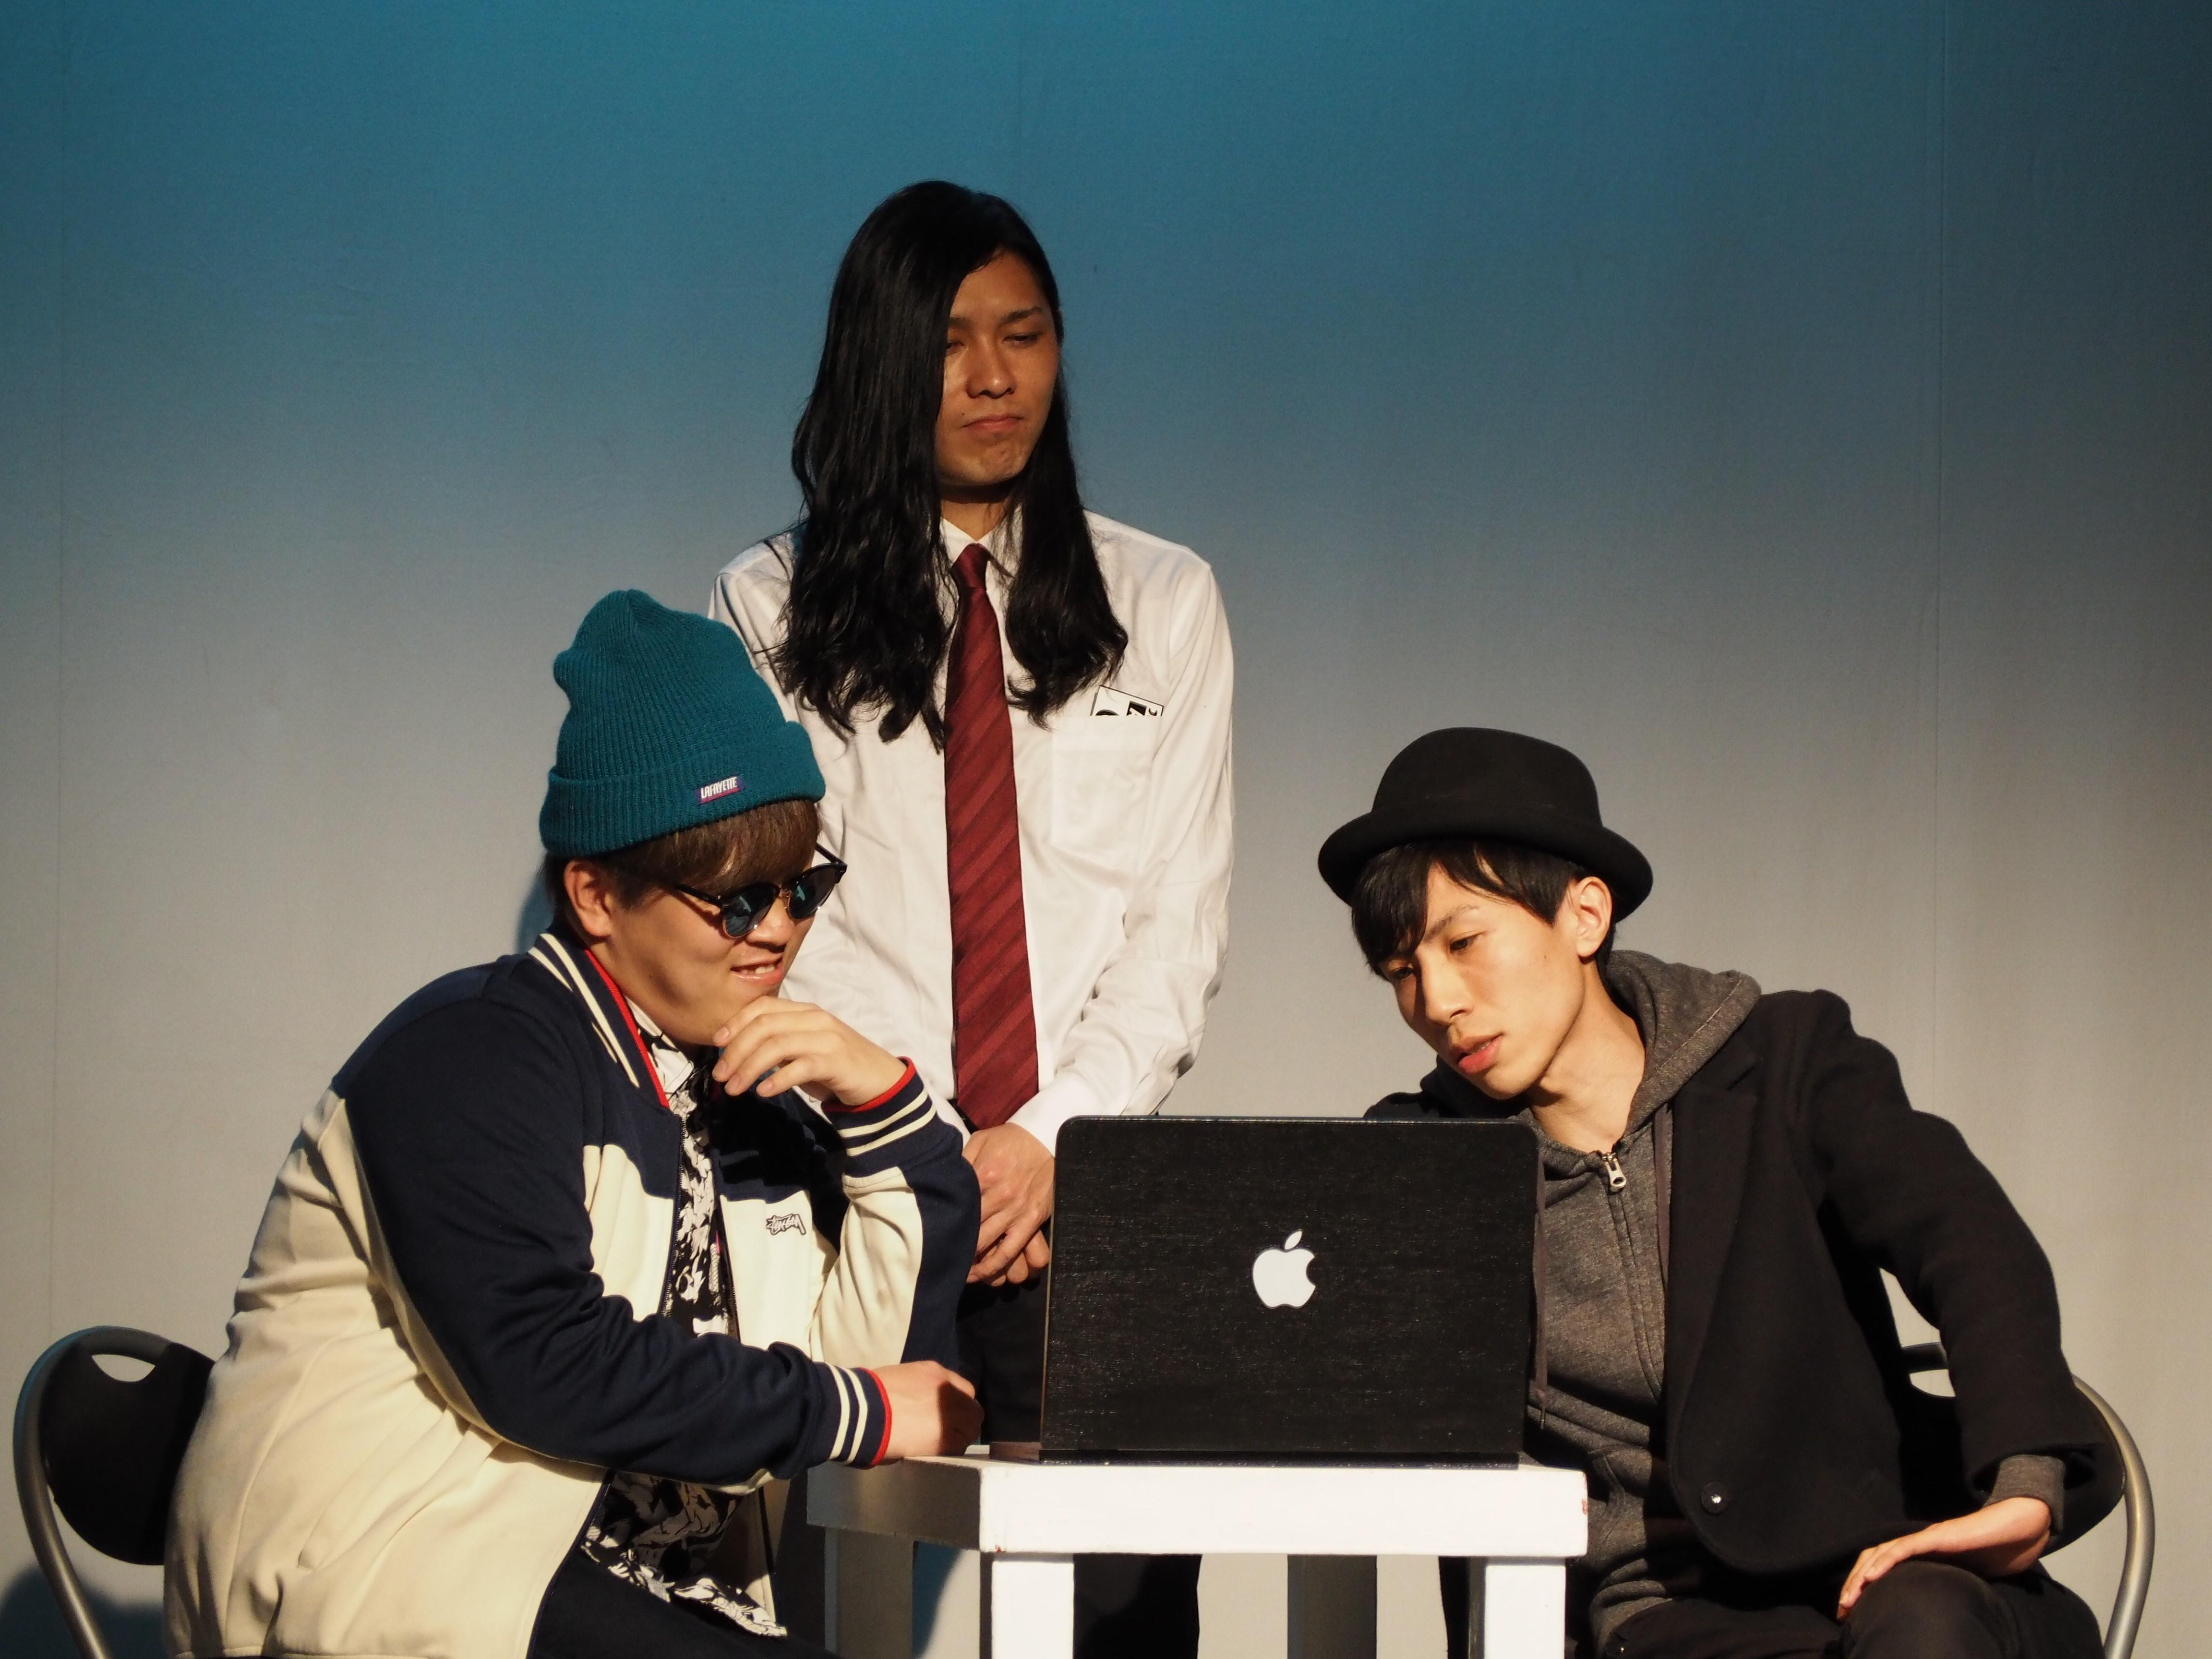 http://news.yoshimoto.co.jp/20180330195952-43e74429b3e4c0fa0e0bc7a2fa3ccd405656cfe2.jpg